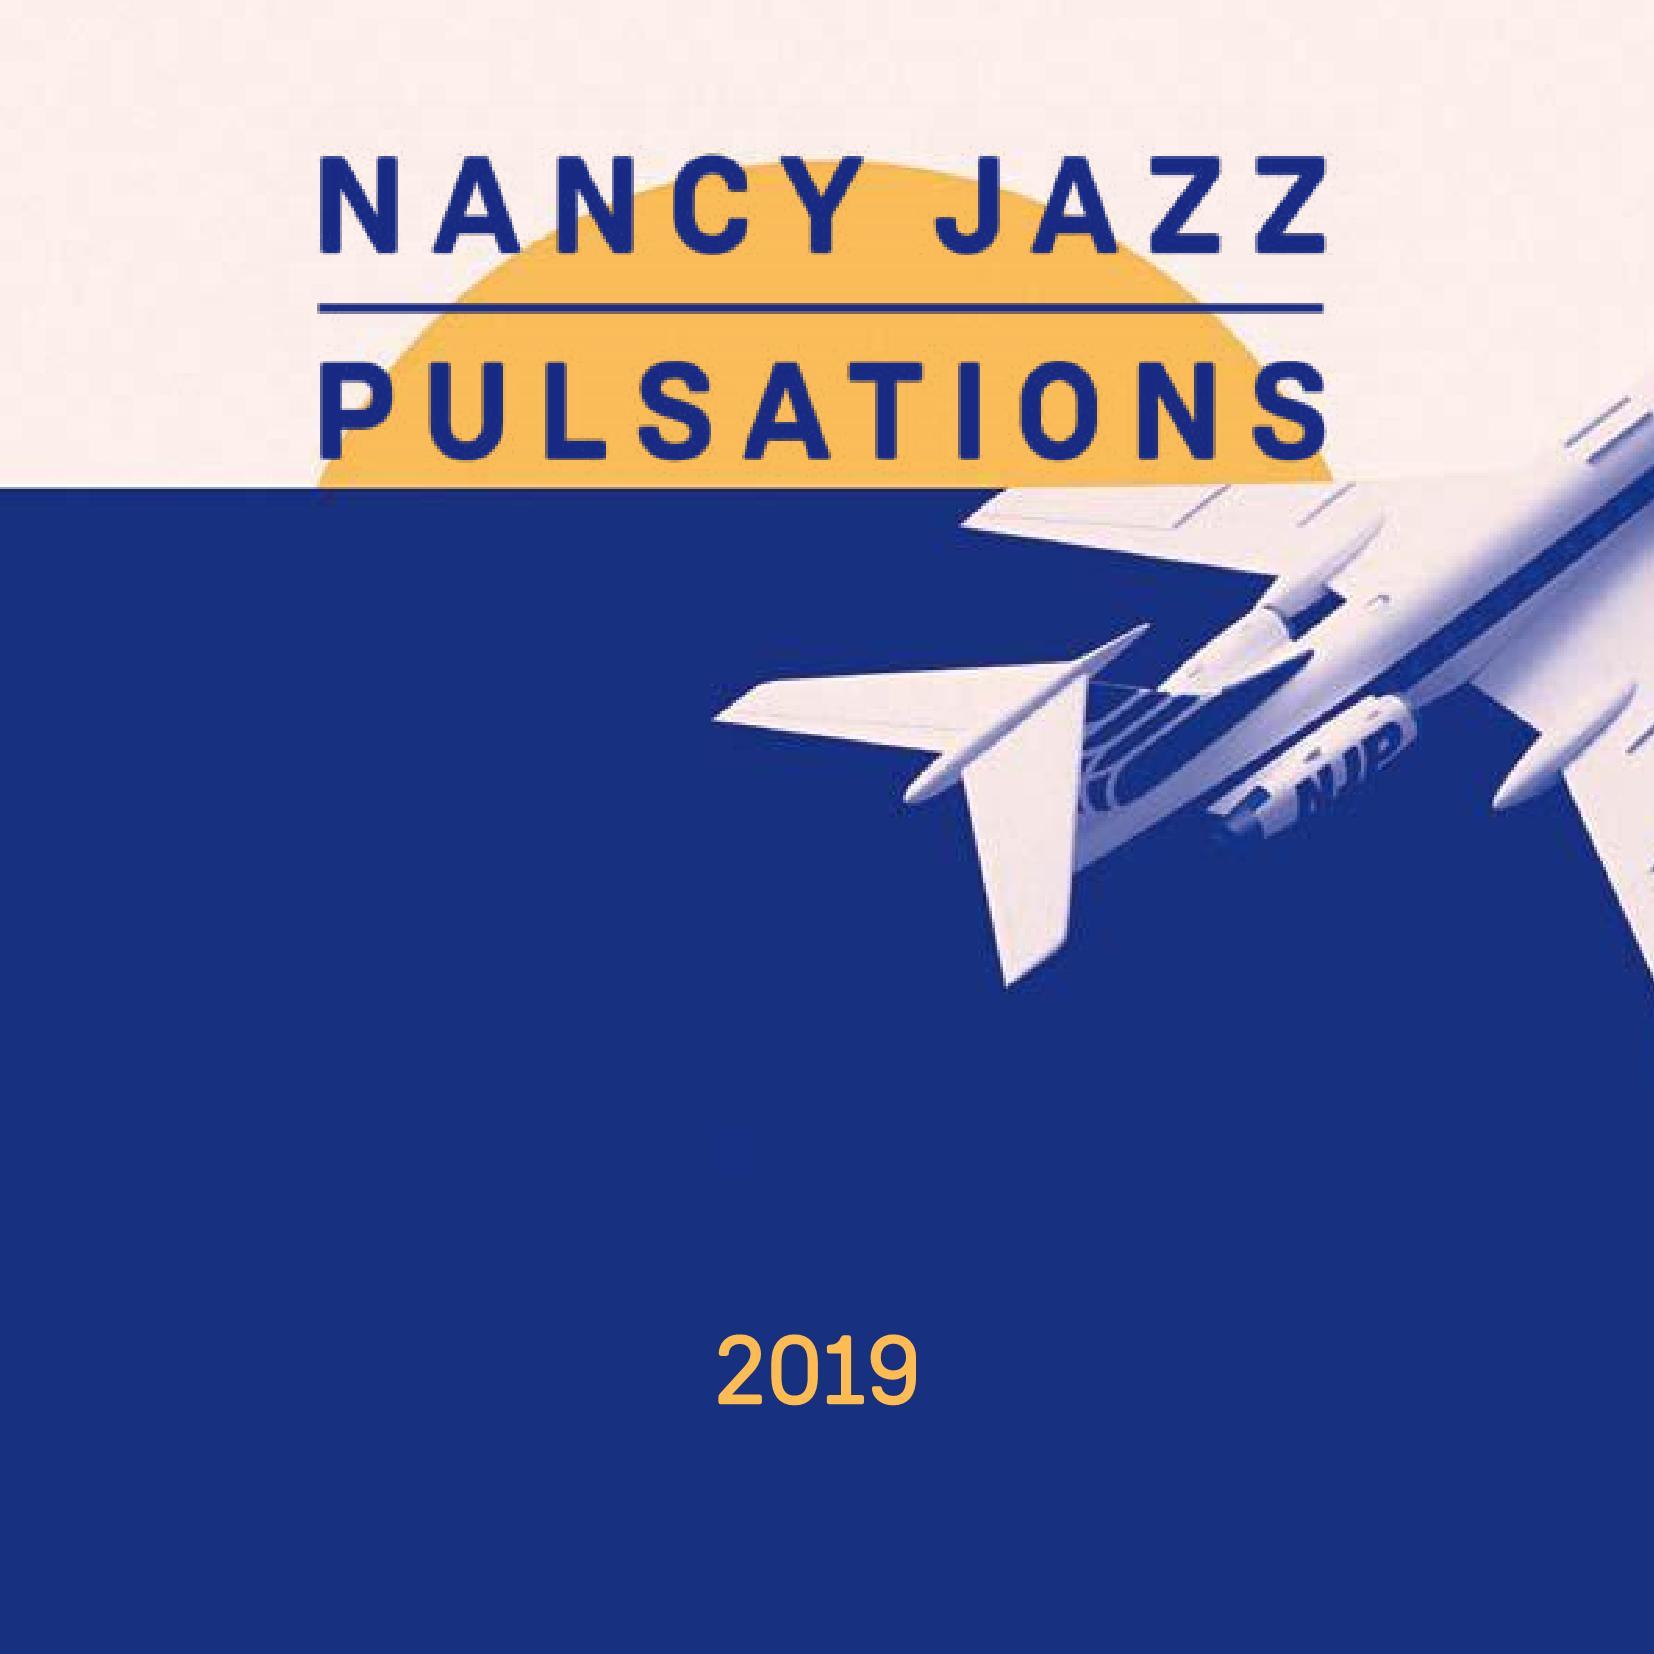 Nancy Jazz Pulsations 2019